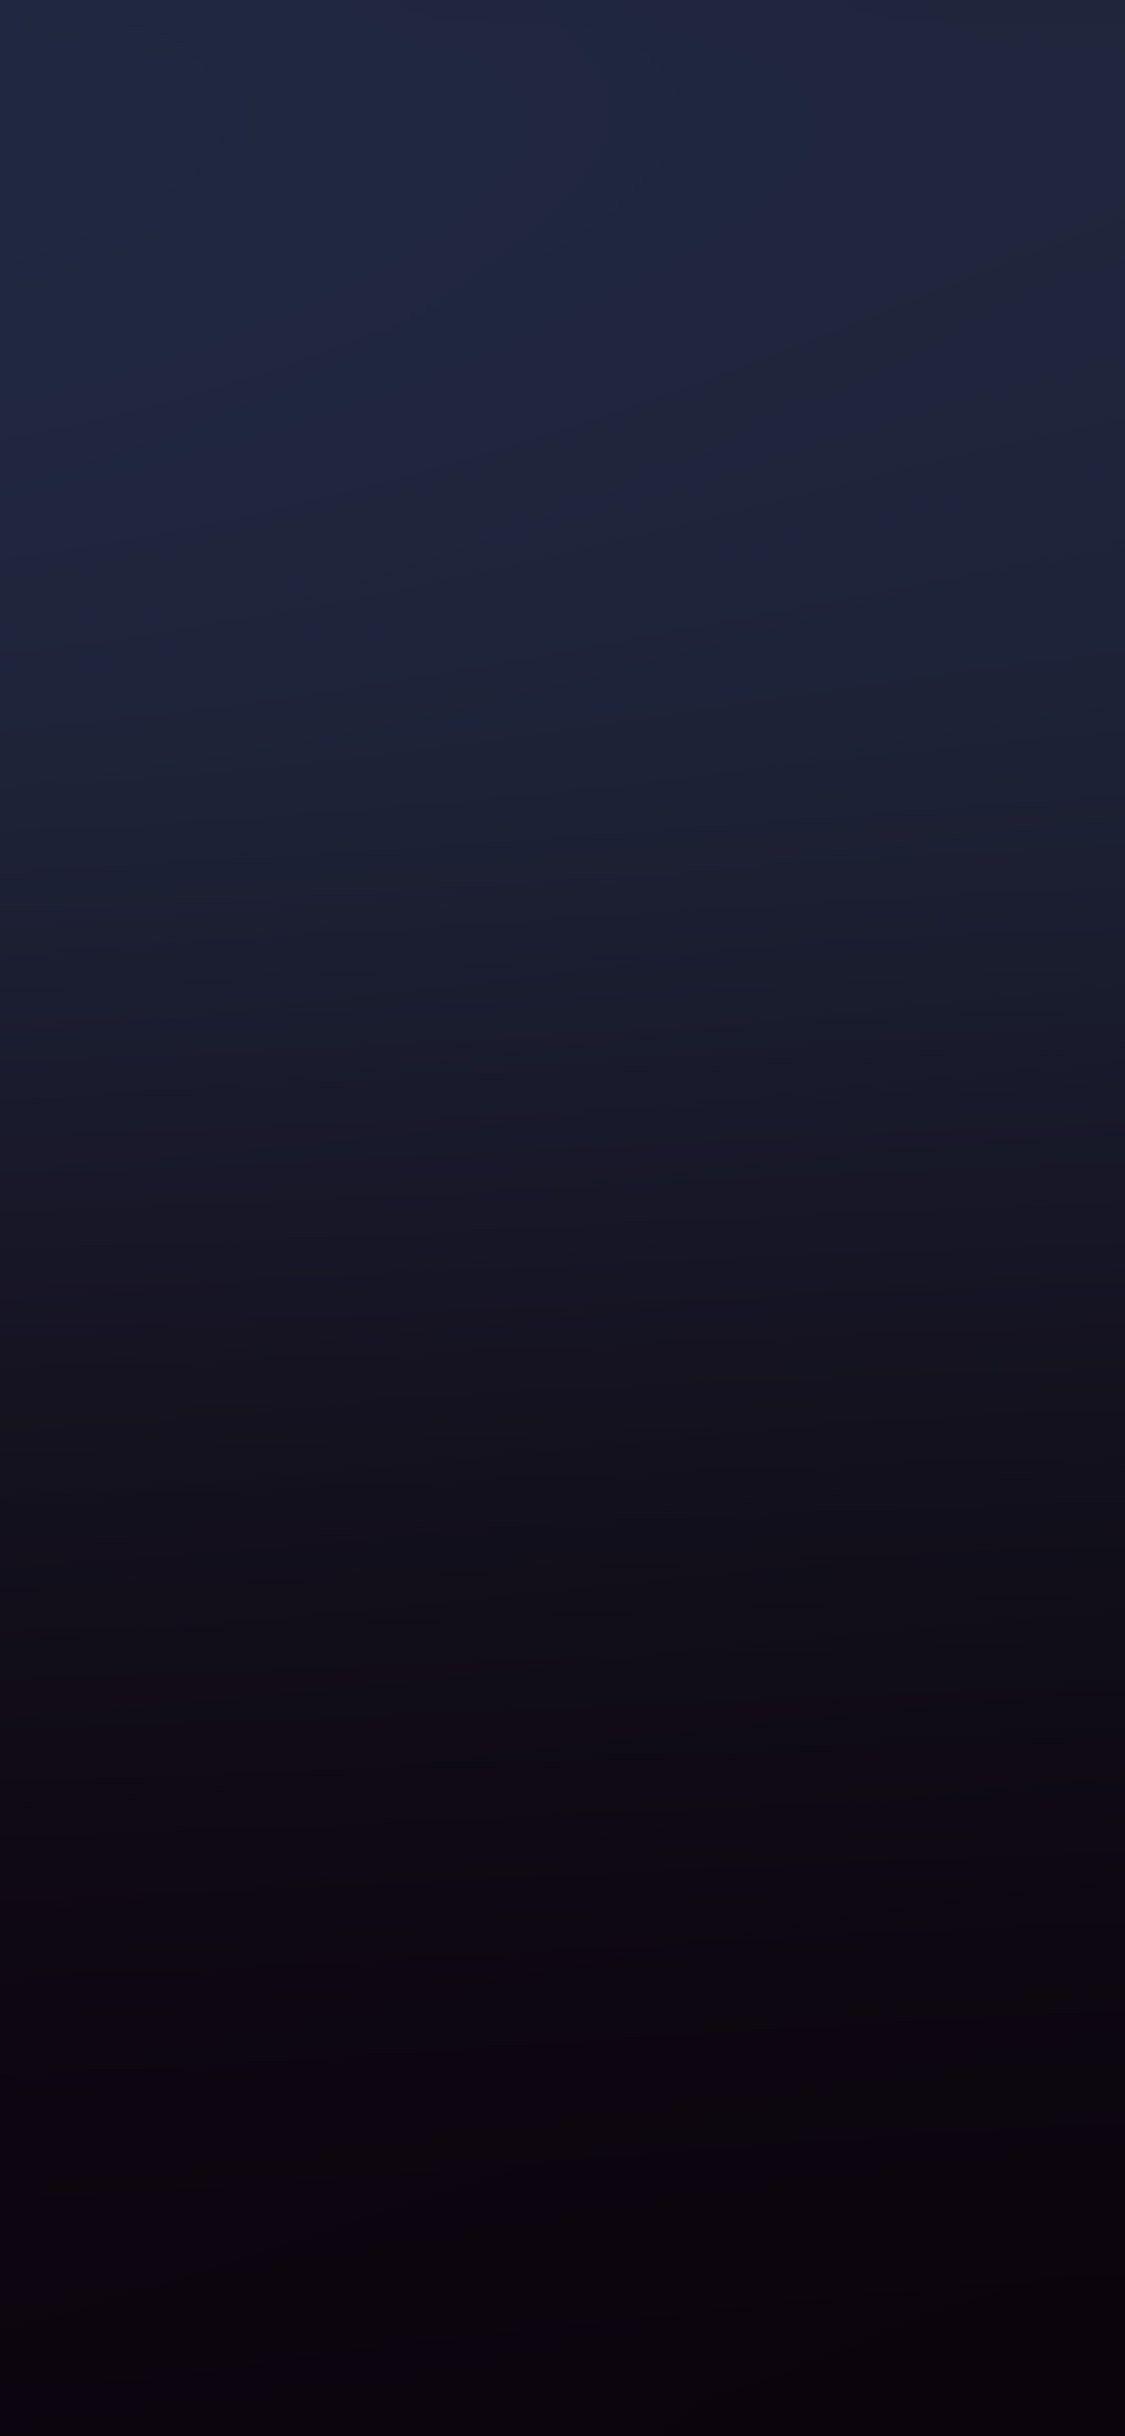 S9 Black Wallpaper Galaxy Colour Abstract Digital Art